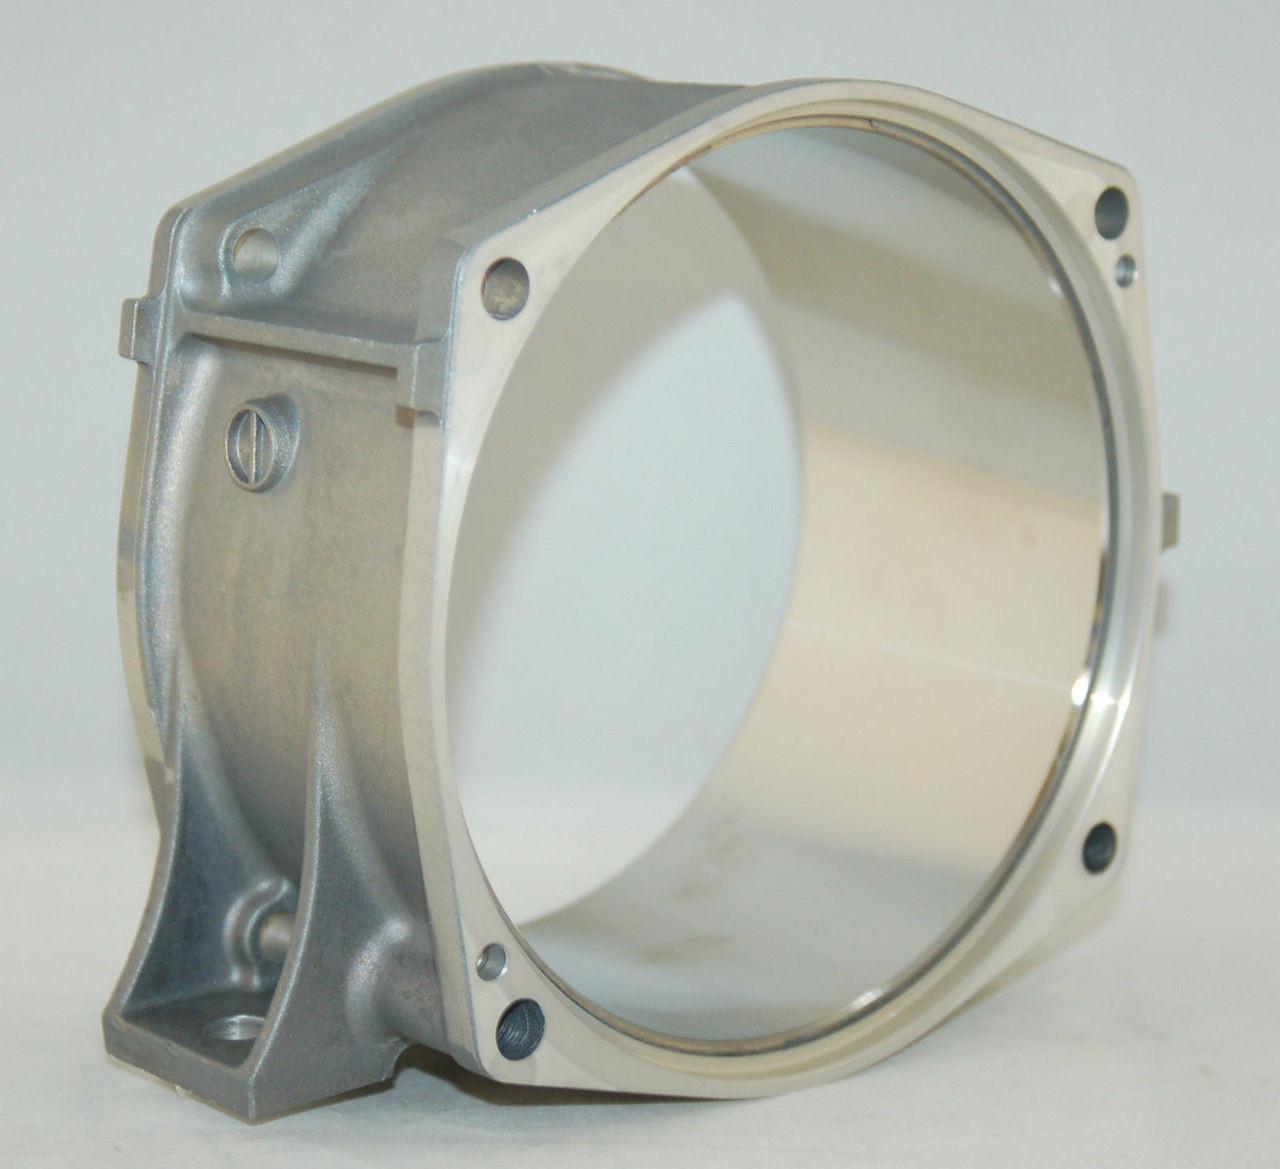 Yamaha Wear Ring Impeller Pump Housing Exciter 135 220 270 1100 1200 AR LX 210